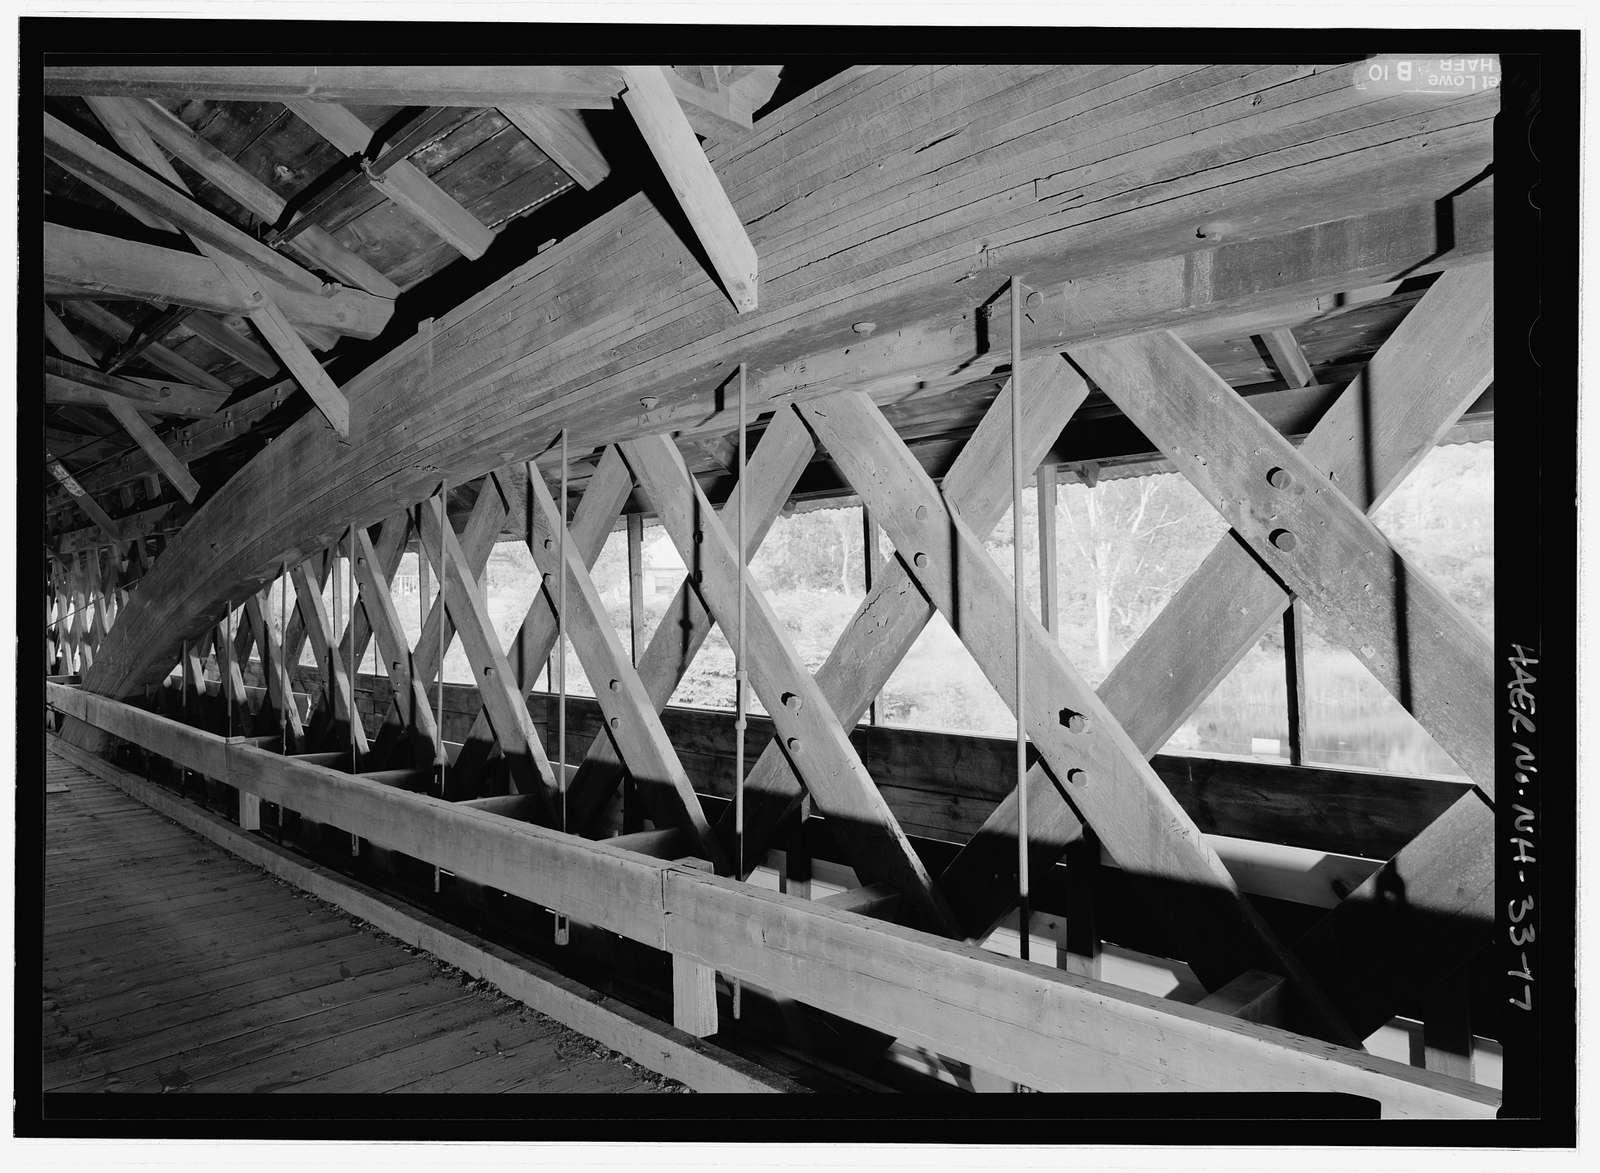 Bath-Haverhill Bridge, Spanning Ammonoosuc River, bypassed section of Ammanoosuc Street (SR 135), Woodsville, Grafton County, NH